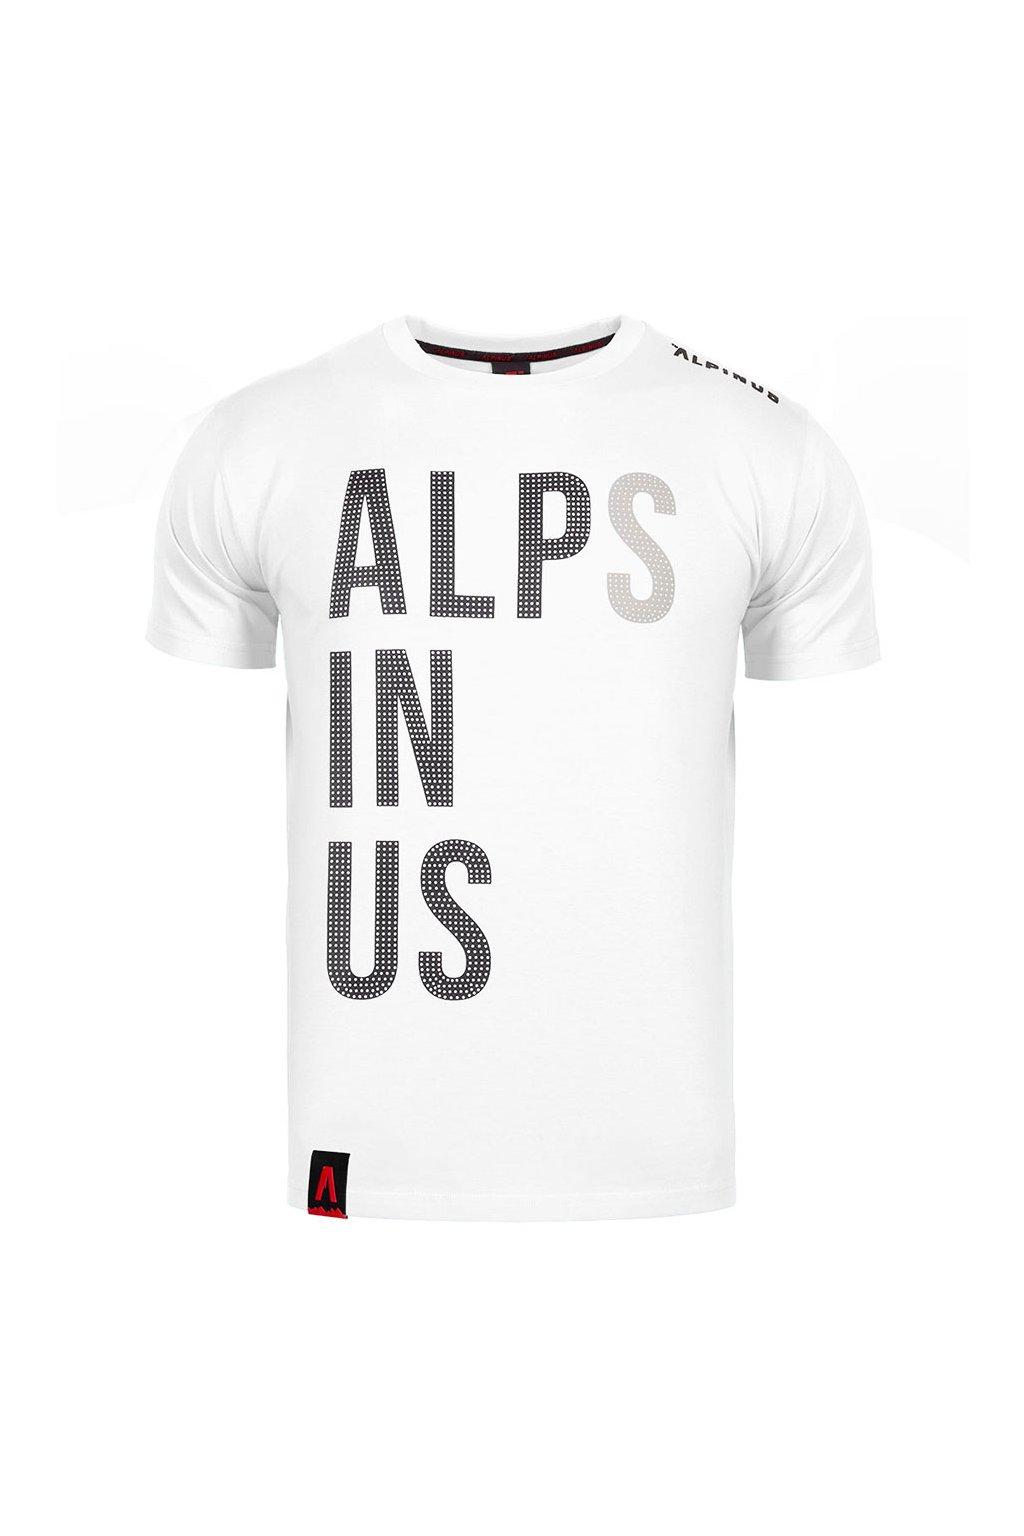 Pánske tričko Alpinus Alps In Us biele ALP20TC0015